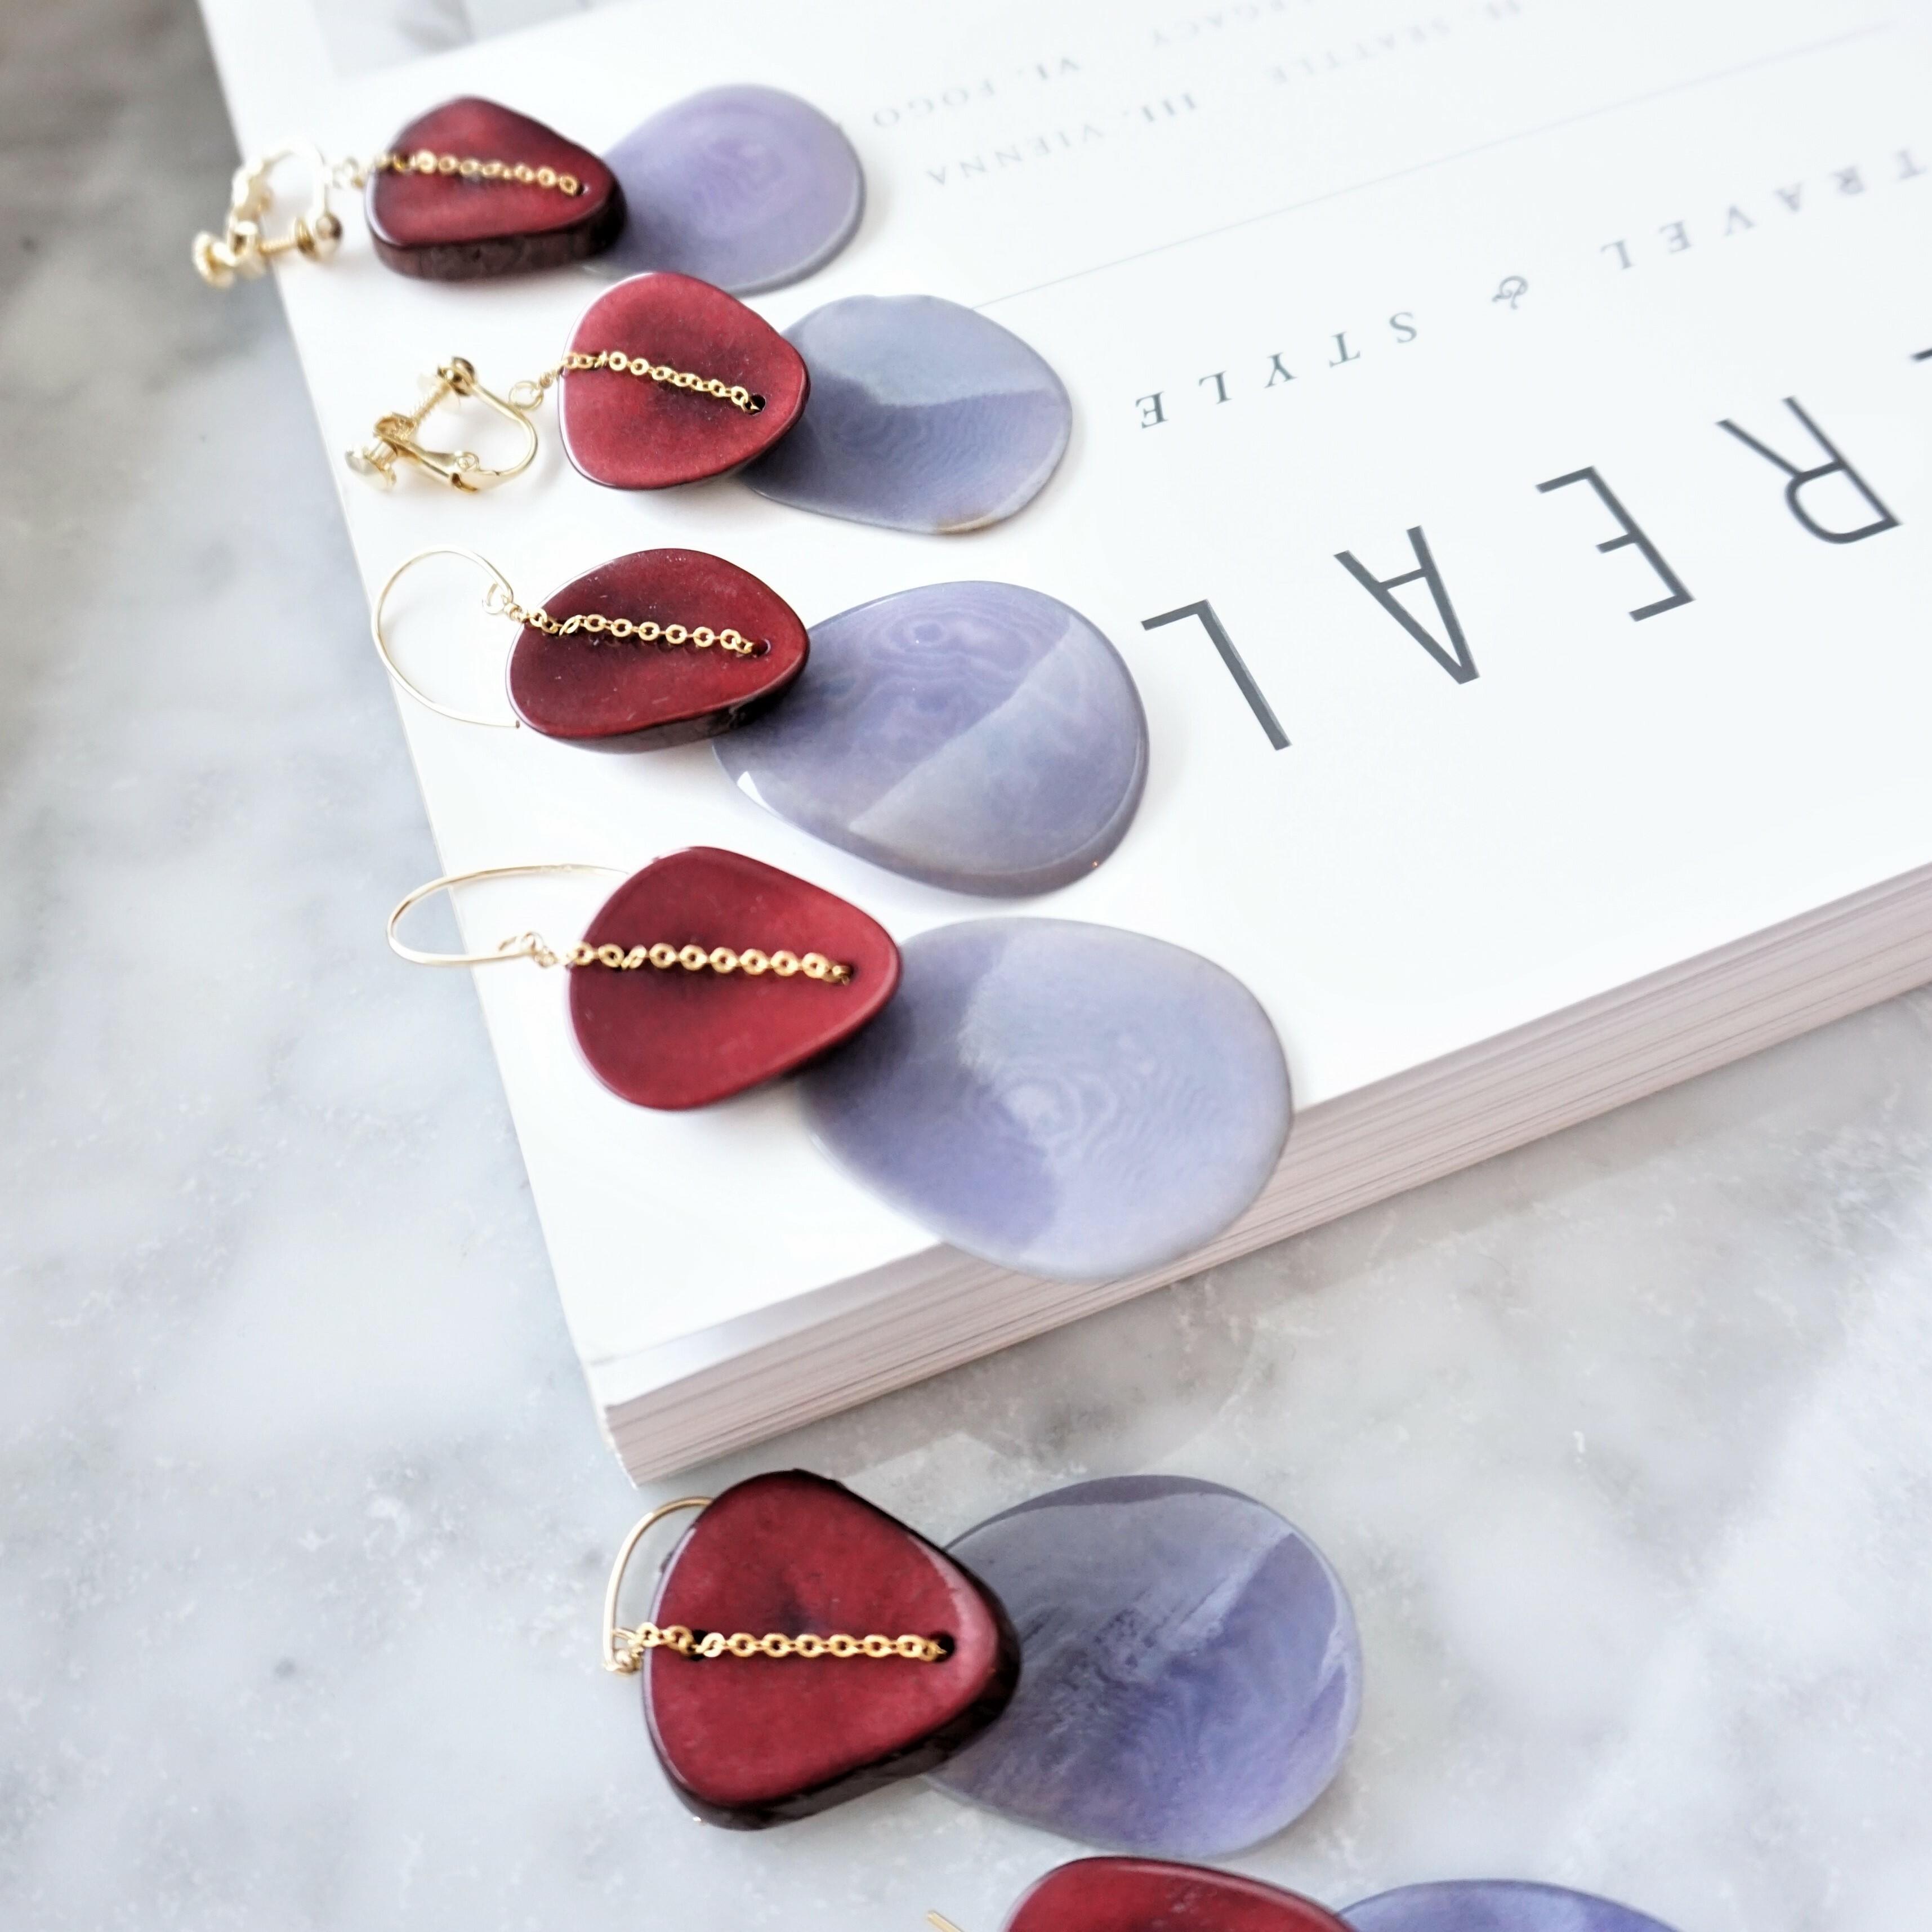 送料無料14kgf*Bordeaux PUR Tagua Nuts pierced earring/earring